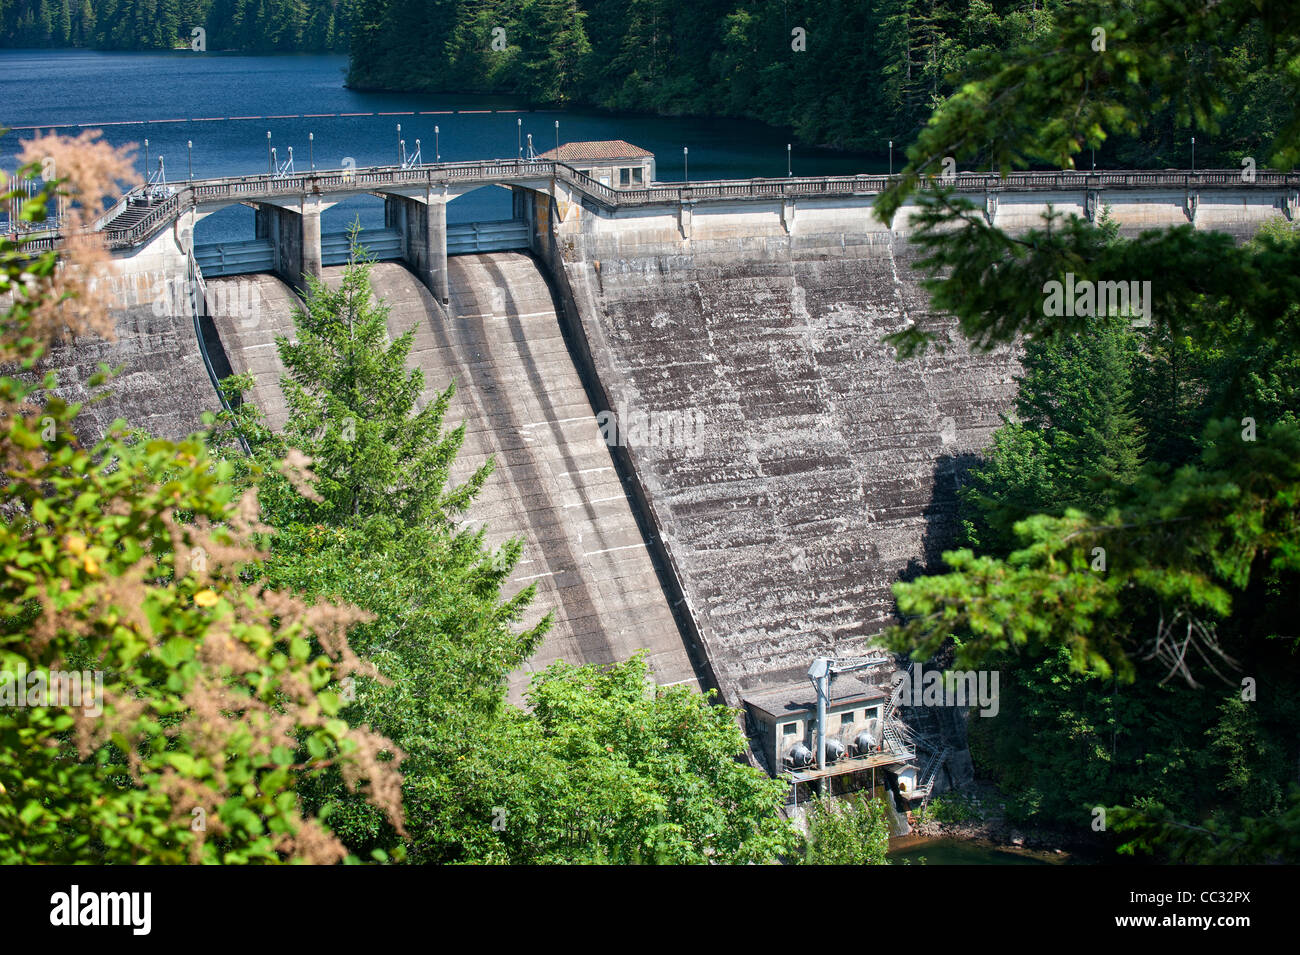 Spillway, Dam 1, Bull Run Watershed, Oregon - Stock Image